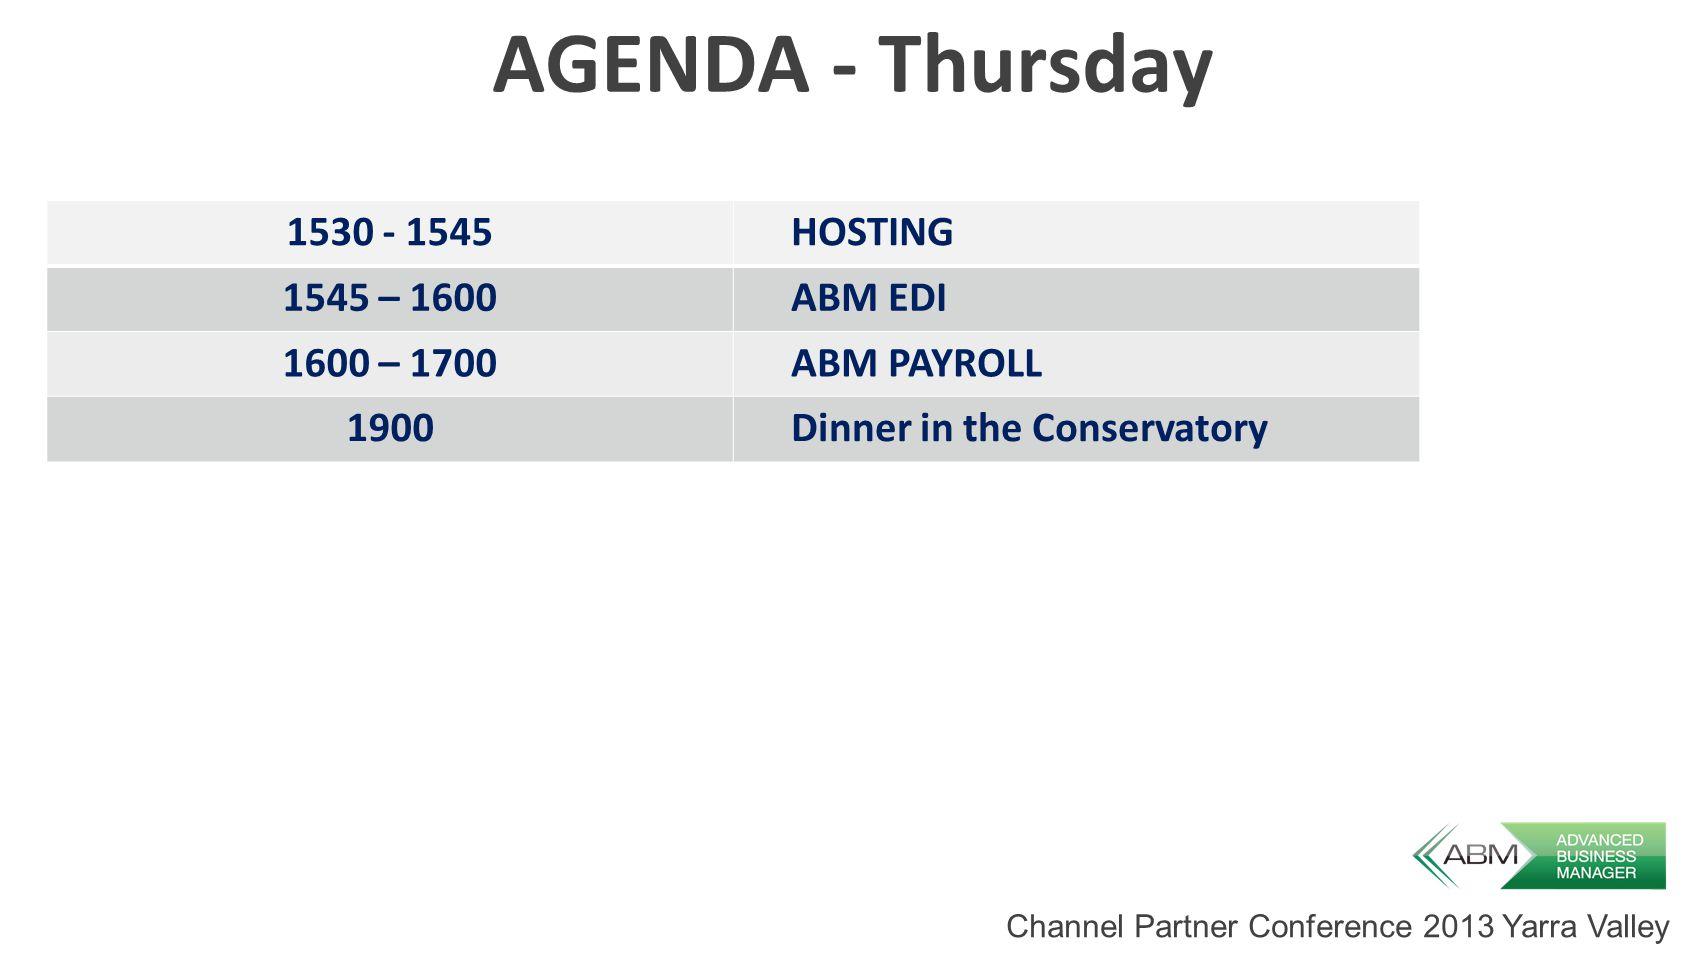 Channel Partner Conference 2013 Yarra Valley AGENDA - Thursday 1530 - 1545HOSTING 1545 – 1600ABM EDI 1600 – 1700ABM PAYROLL 1900Dinner in the Conservatory